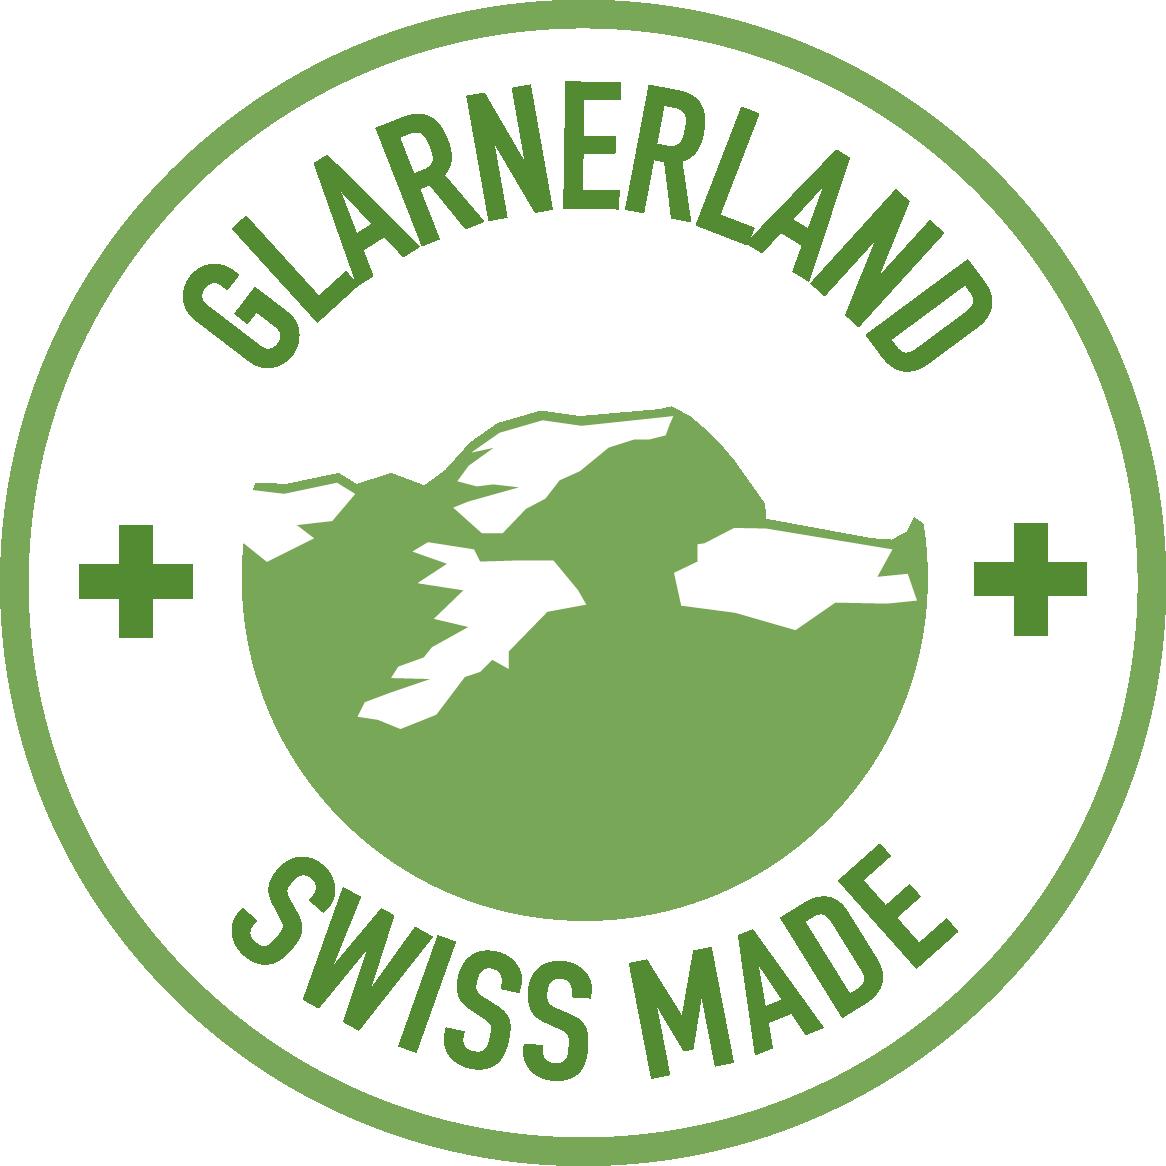 Glarnerland_Swissmade Icon